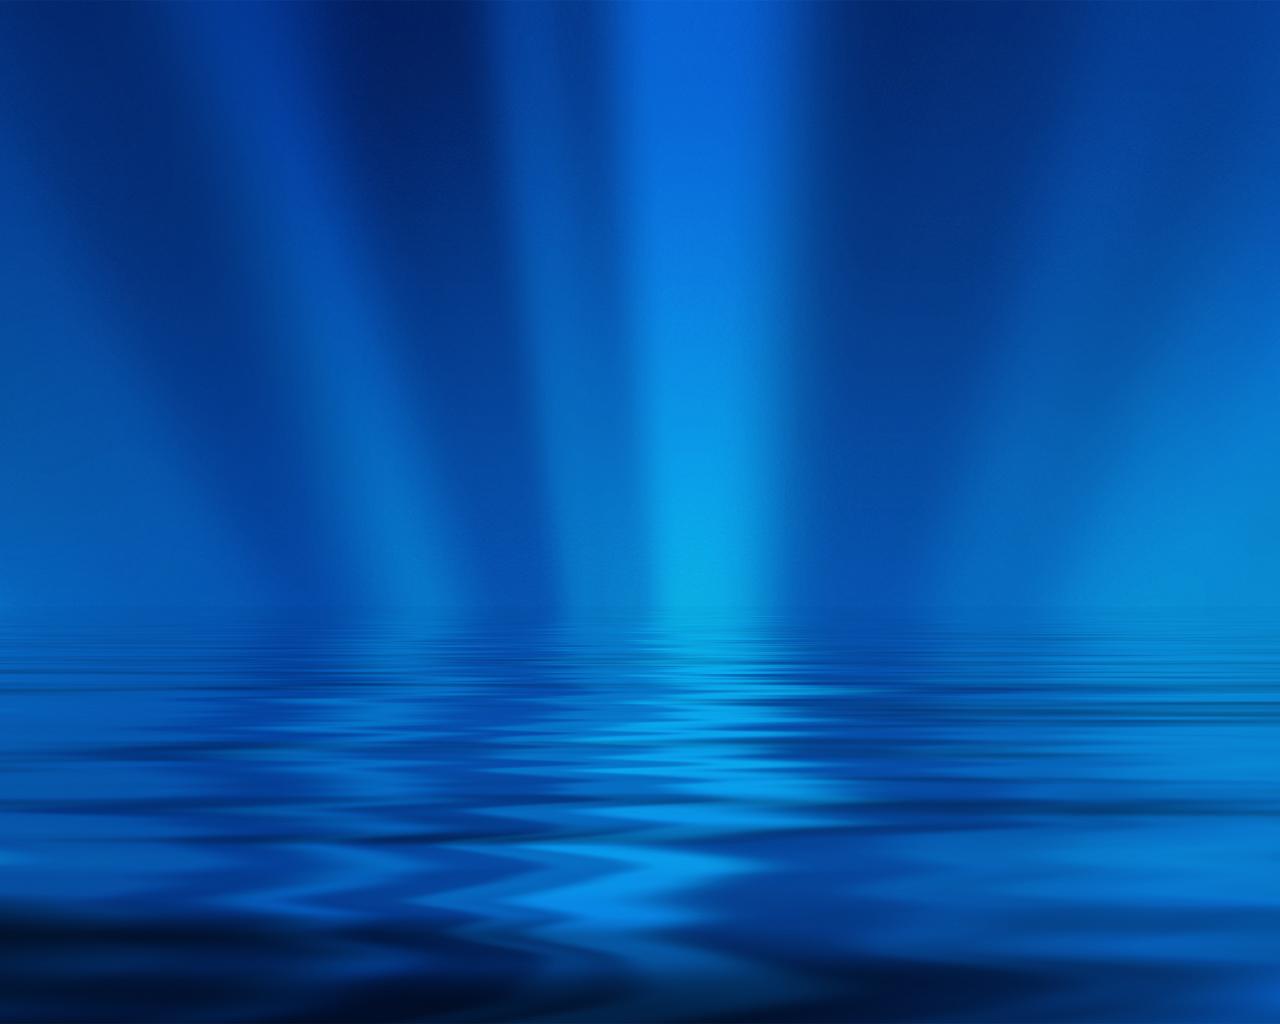 Blue Wallpapers HD | Free Download Wallpaper | DaWallpaperz